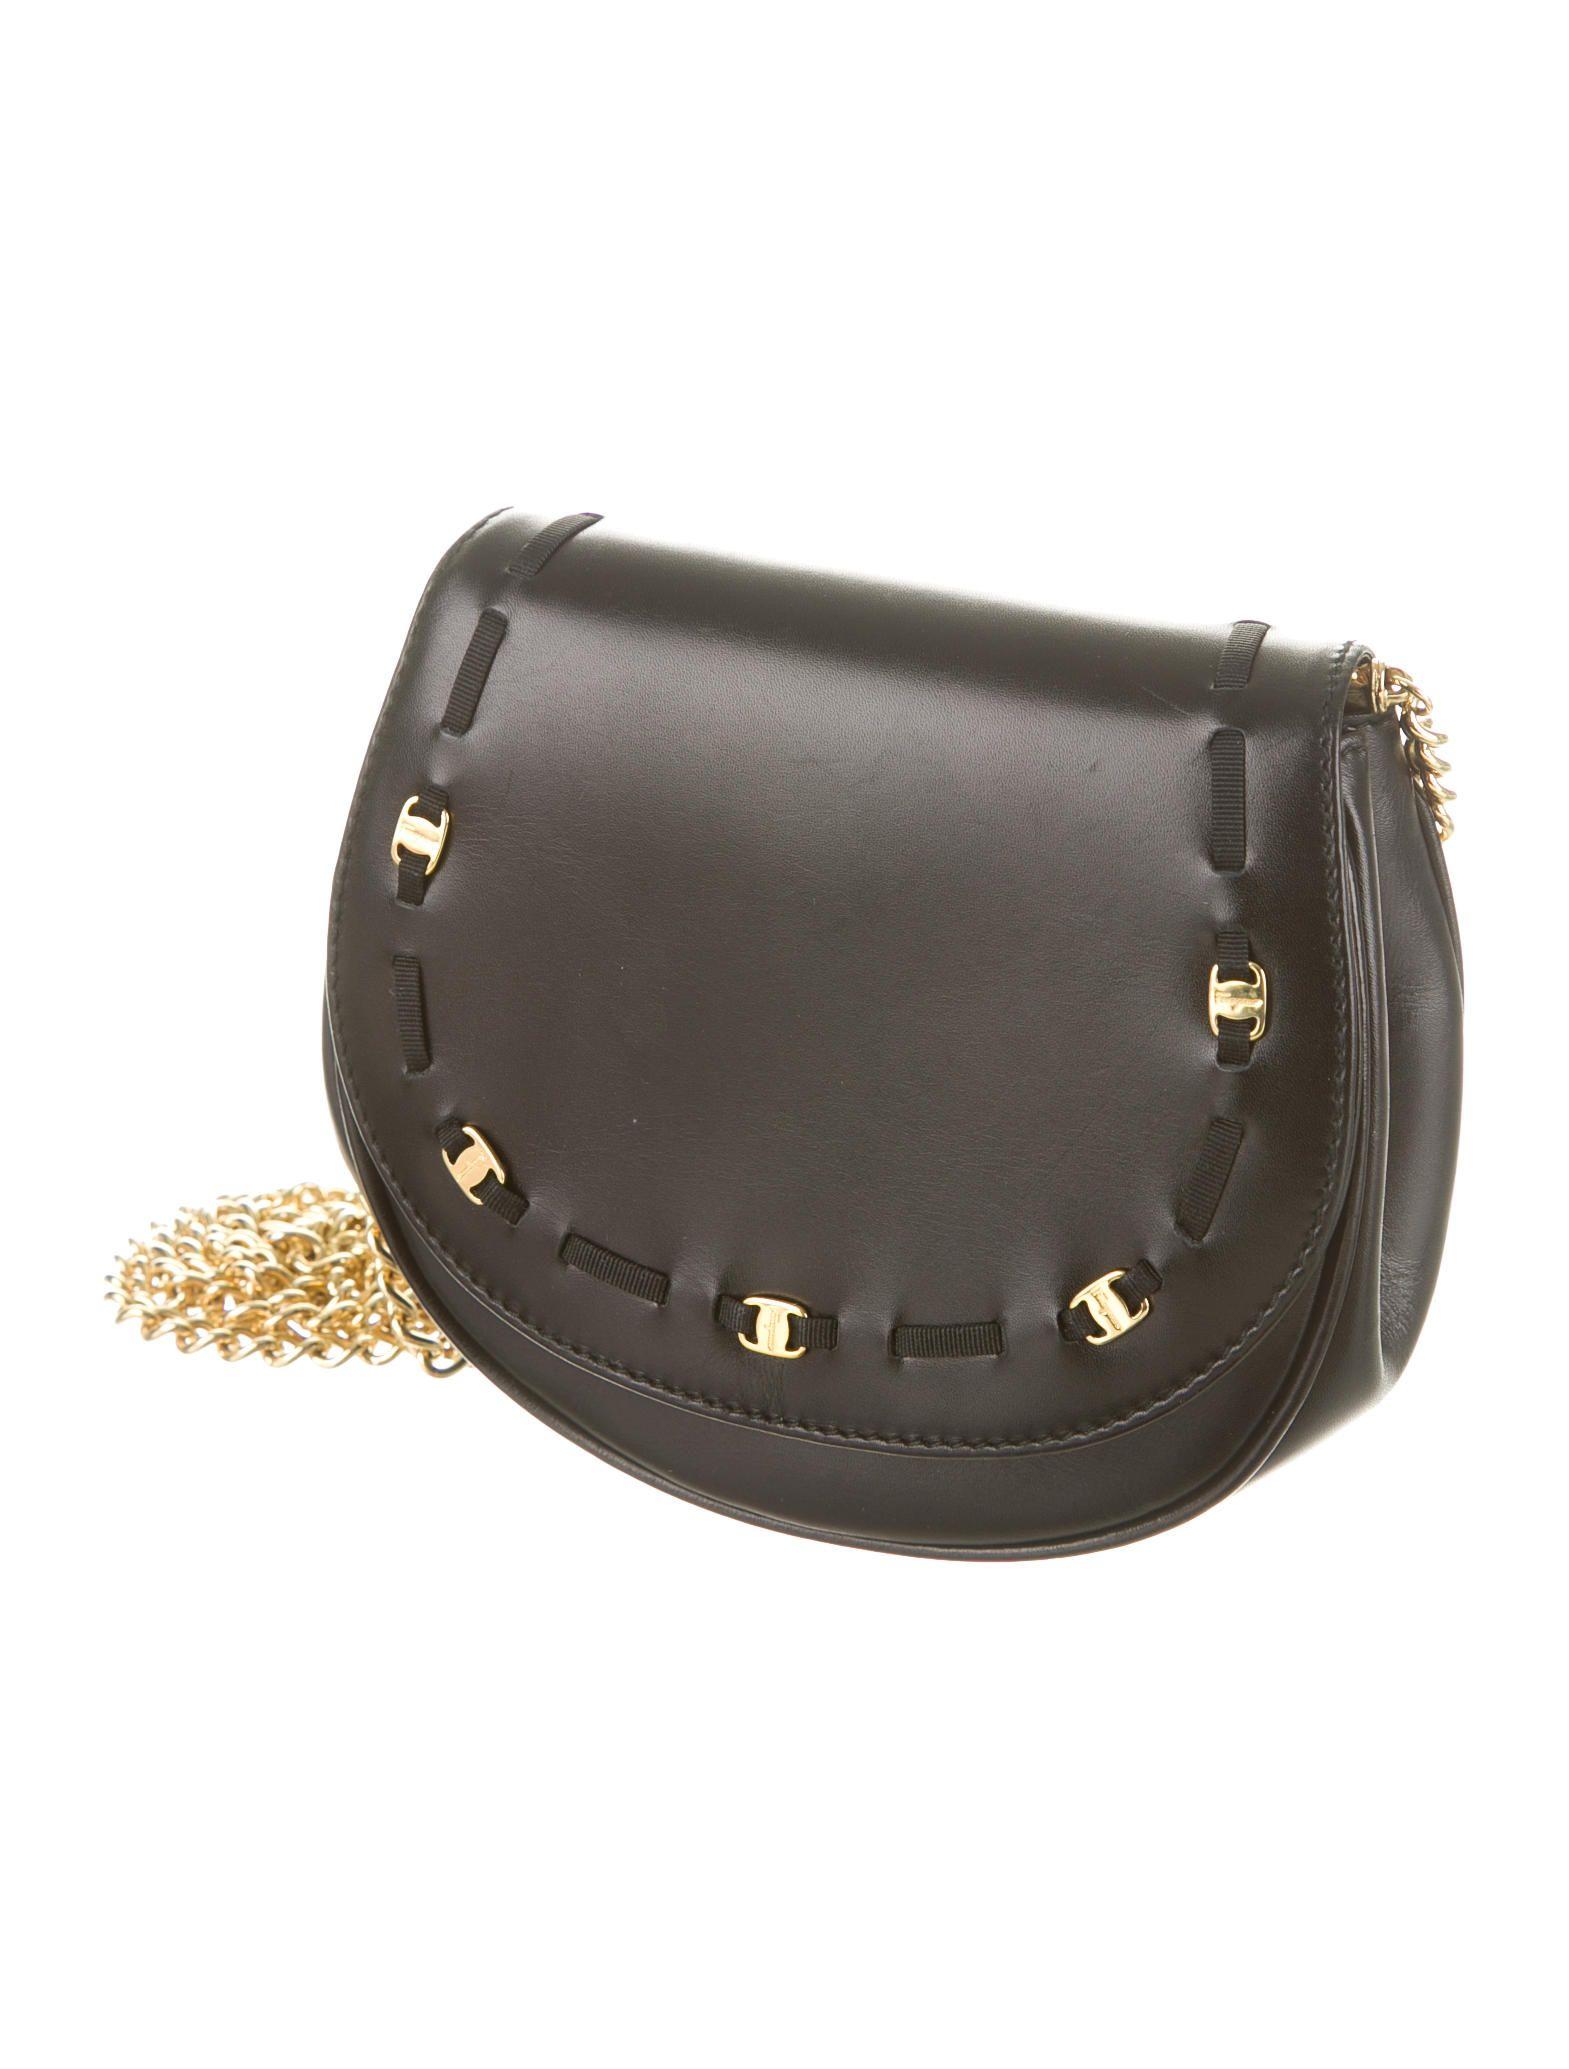 058c4a72cb7e Salvatore Ferragamo Crossbody Bag - Handbags - SAL23332